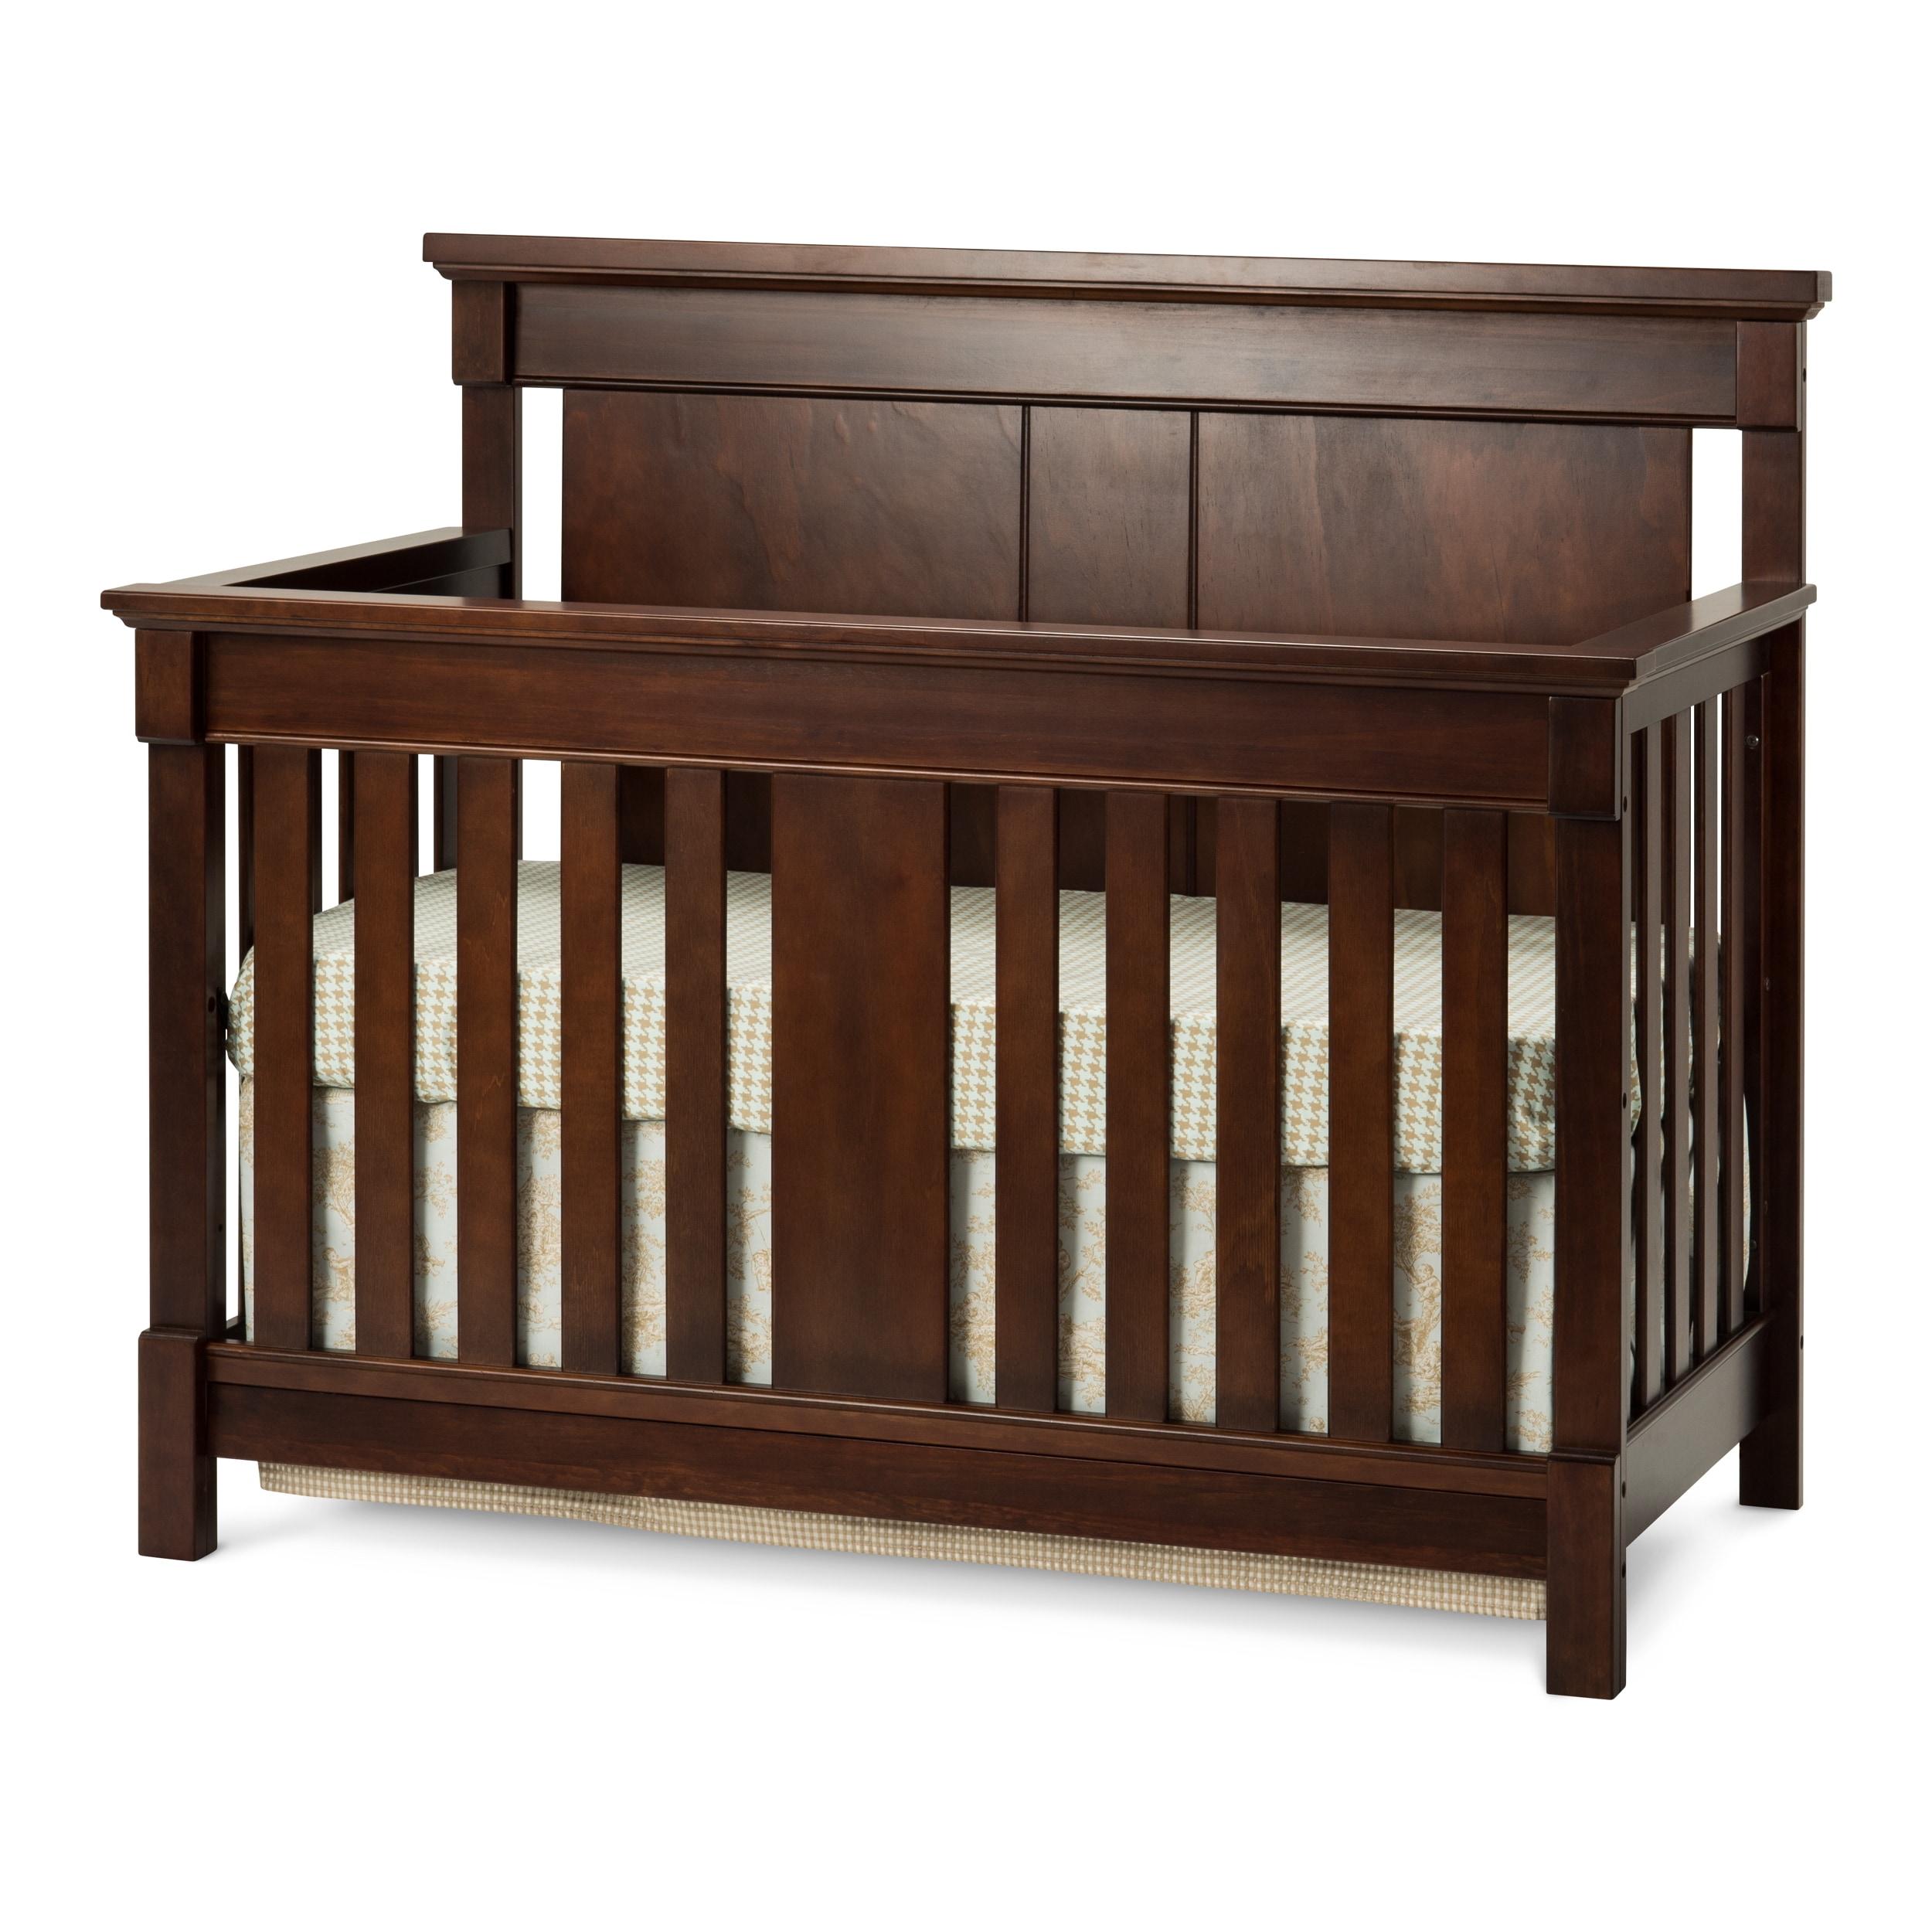 Child Craft 'Bradford' 4-in-1 Lifetime Convertible Crib